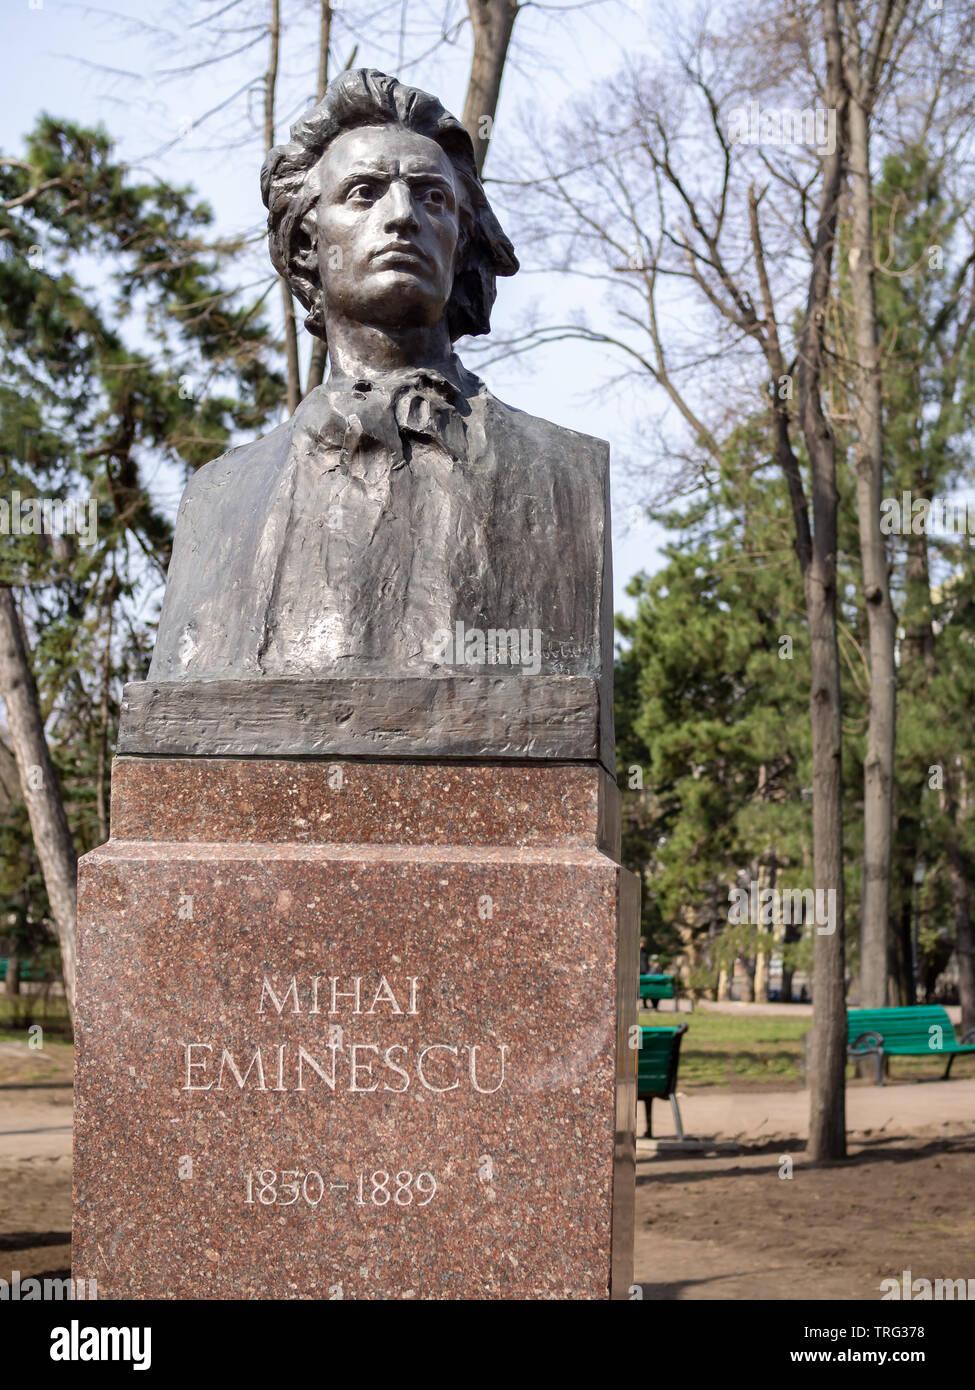 CHISINAU, MOLDOVA-MARCH 21, 2019: Mihai Eminescu bust by Lazar Dubinovschi in the Alley of Classics - Stock Image